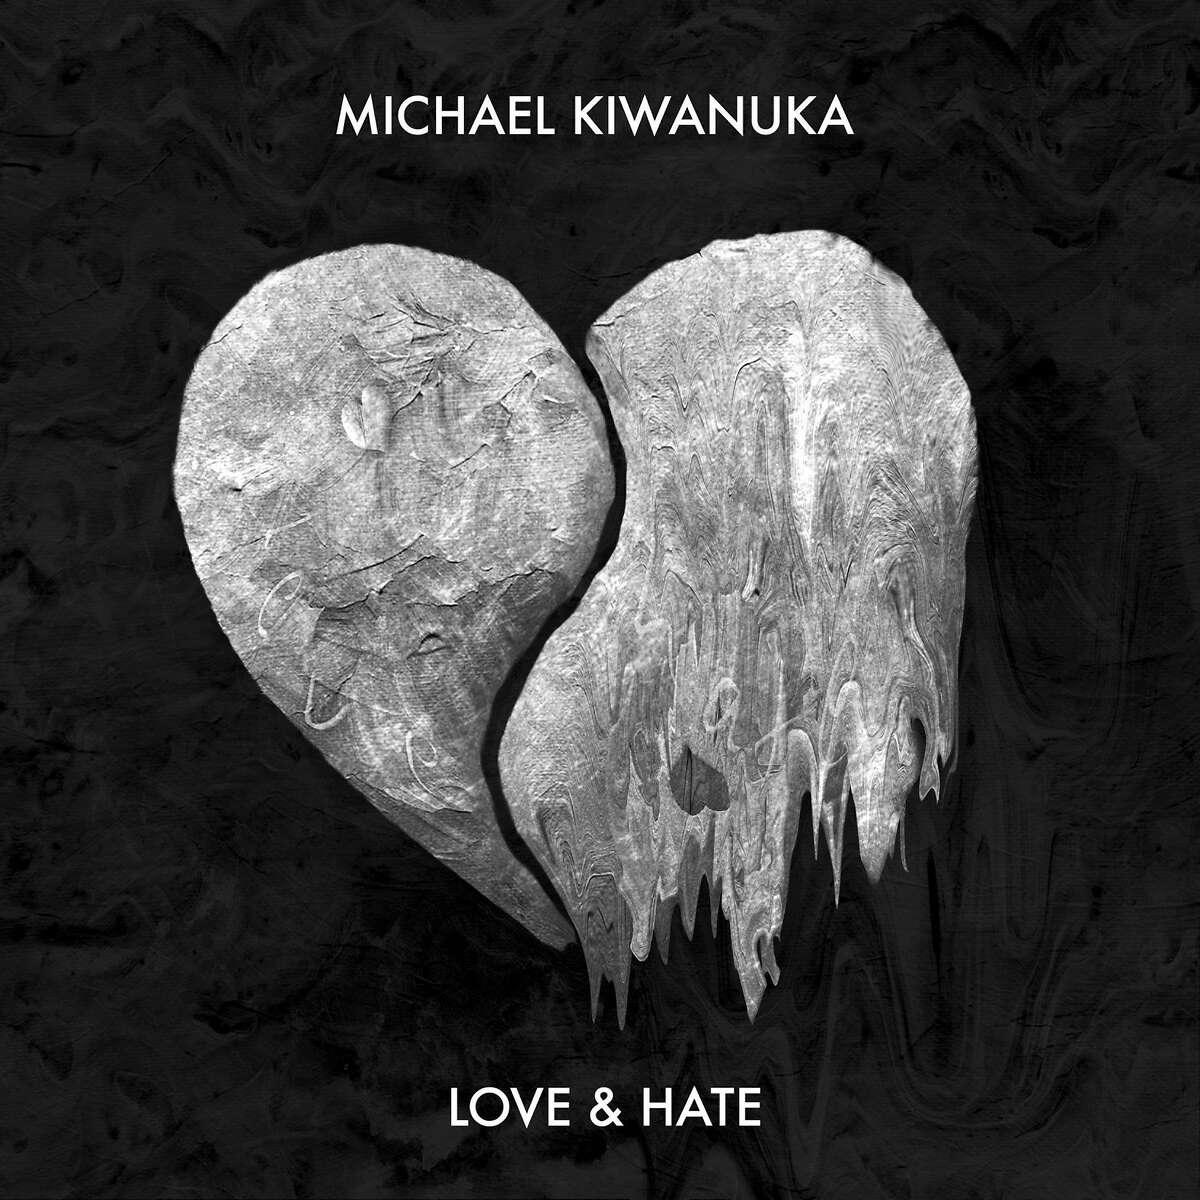 Michael Kiwanuka's second album is 'Love &Hate'